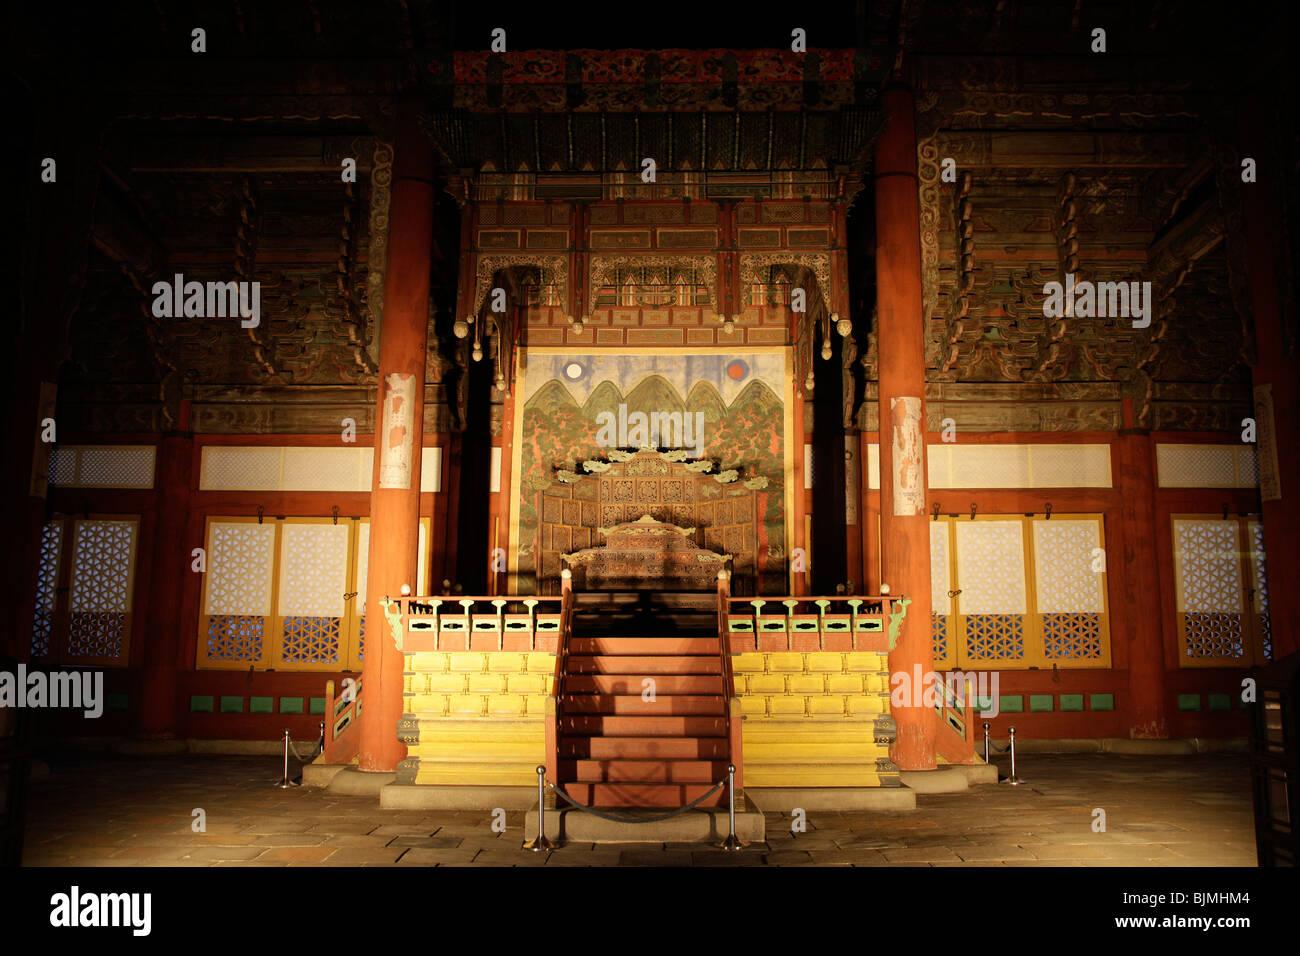 Throne in the Deoksugung royal palace, Palace of Longevity, Korean capital Seoul, South Korea, Asia - Stock Image